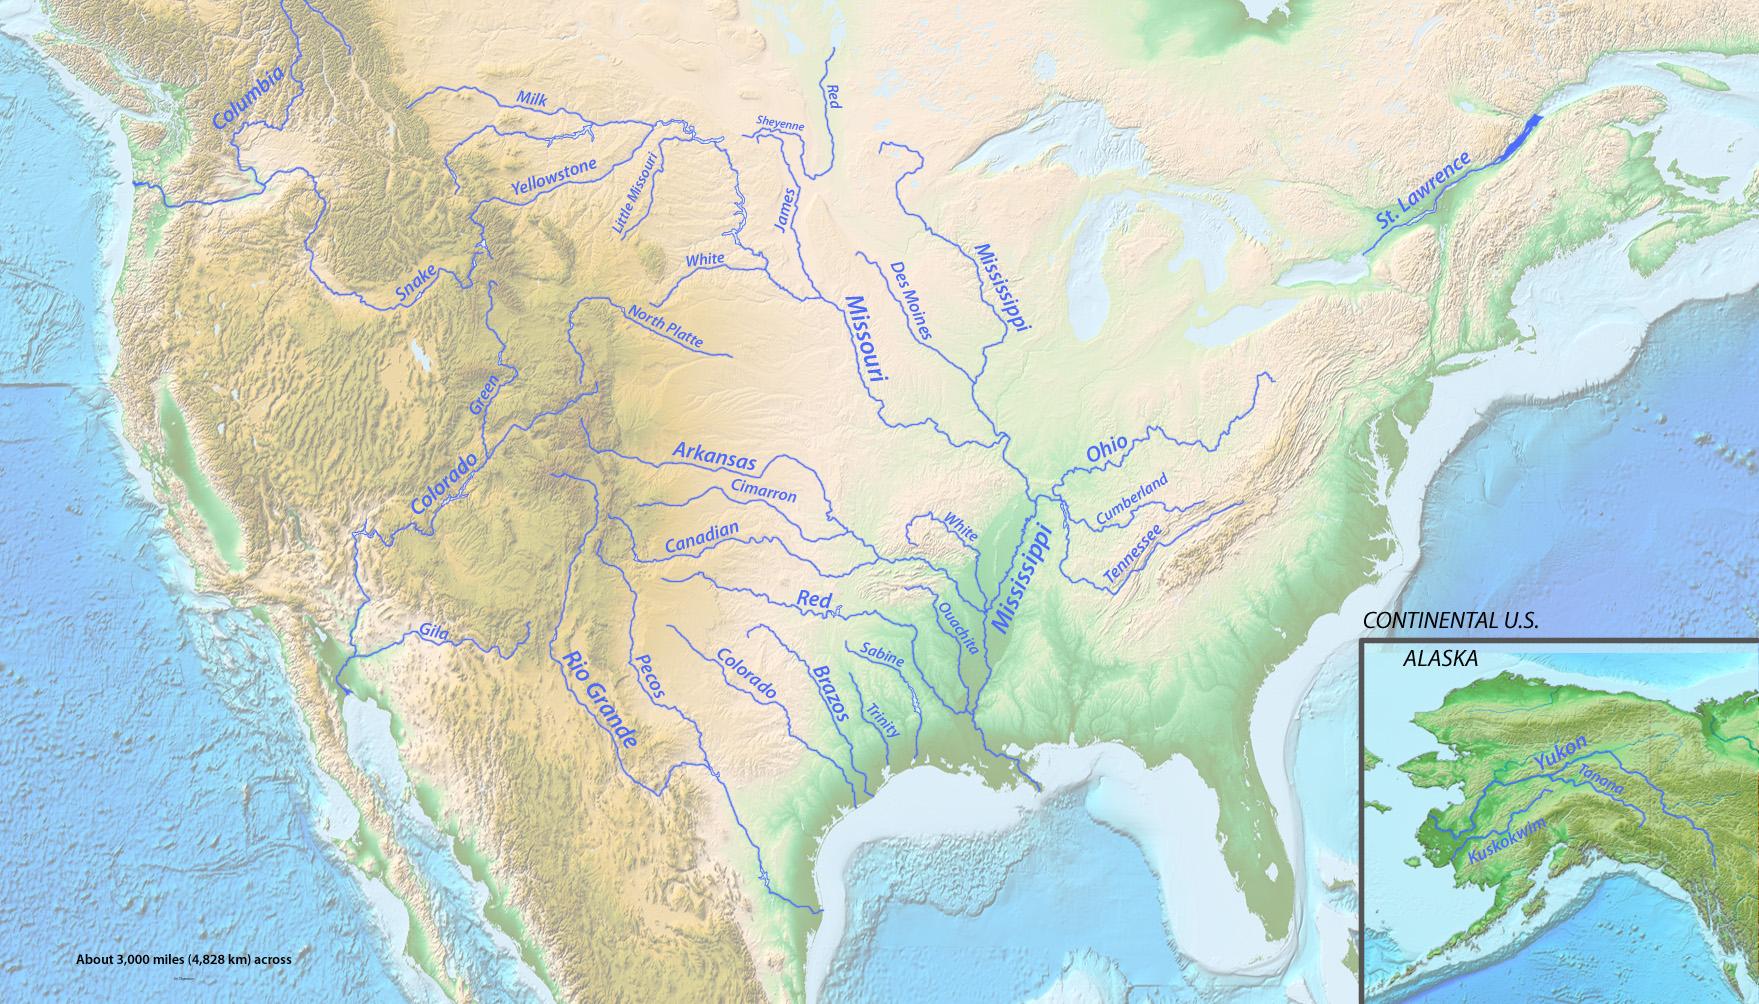 FileLongest Rivers Of The US With Labelsjpg Wikimedia Commons - Ten longest rivers